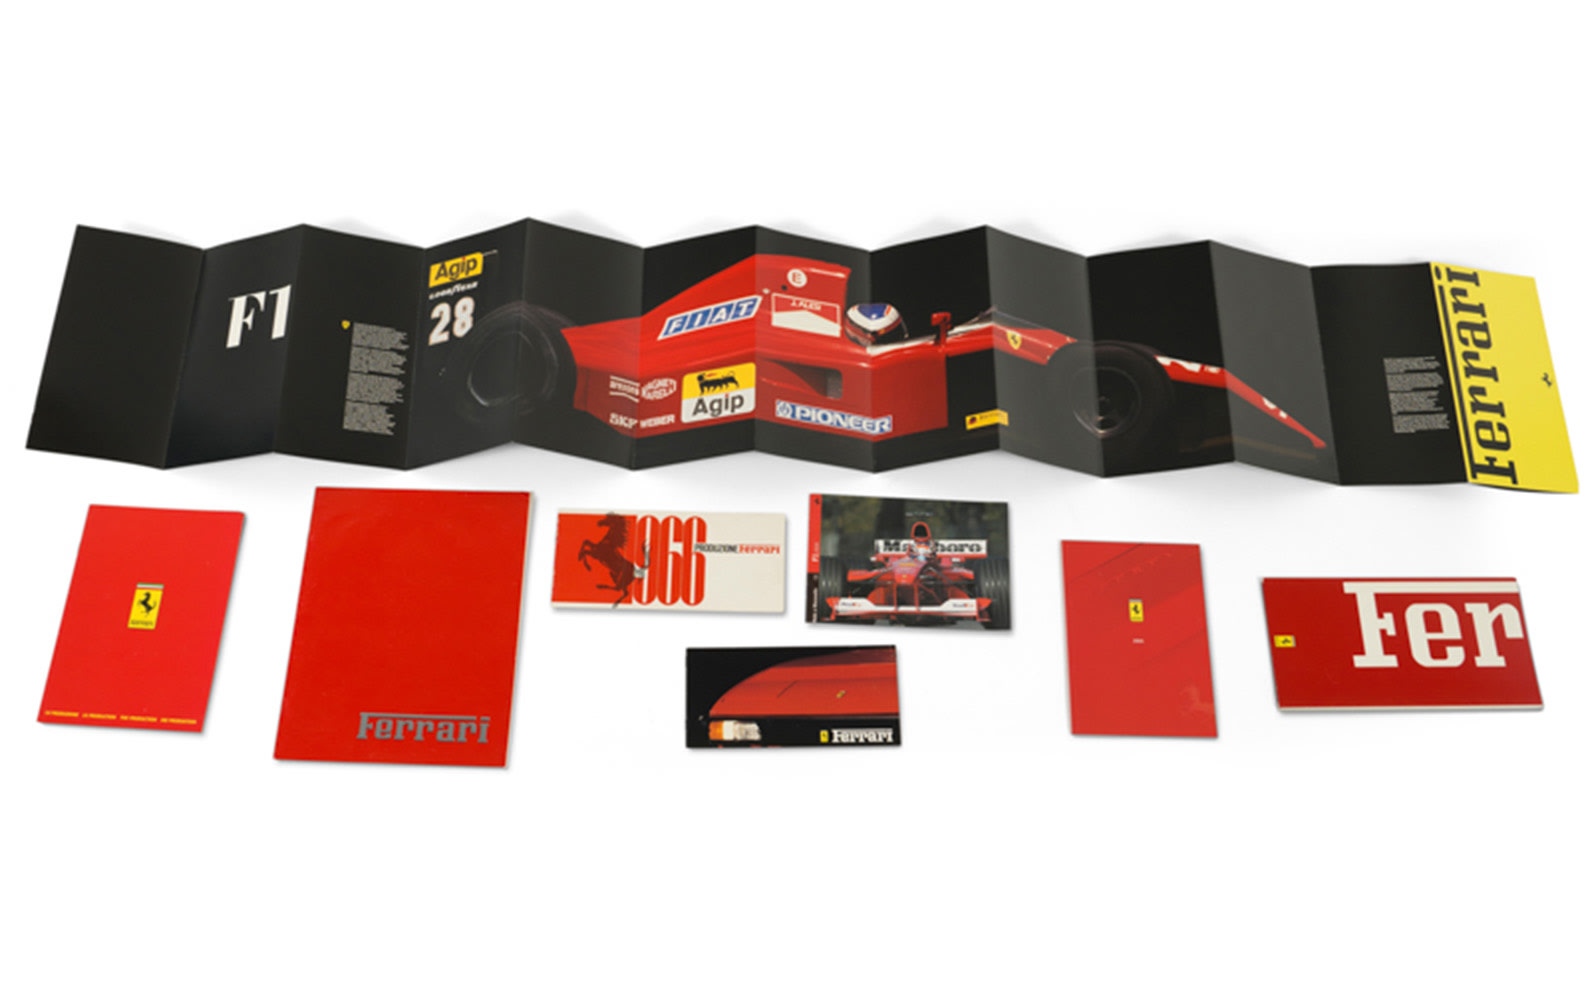 Assorted Ferrari Brochures, Including 1966 Product Line Brochure